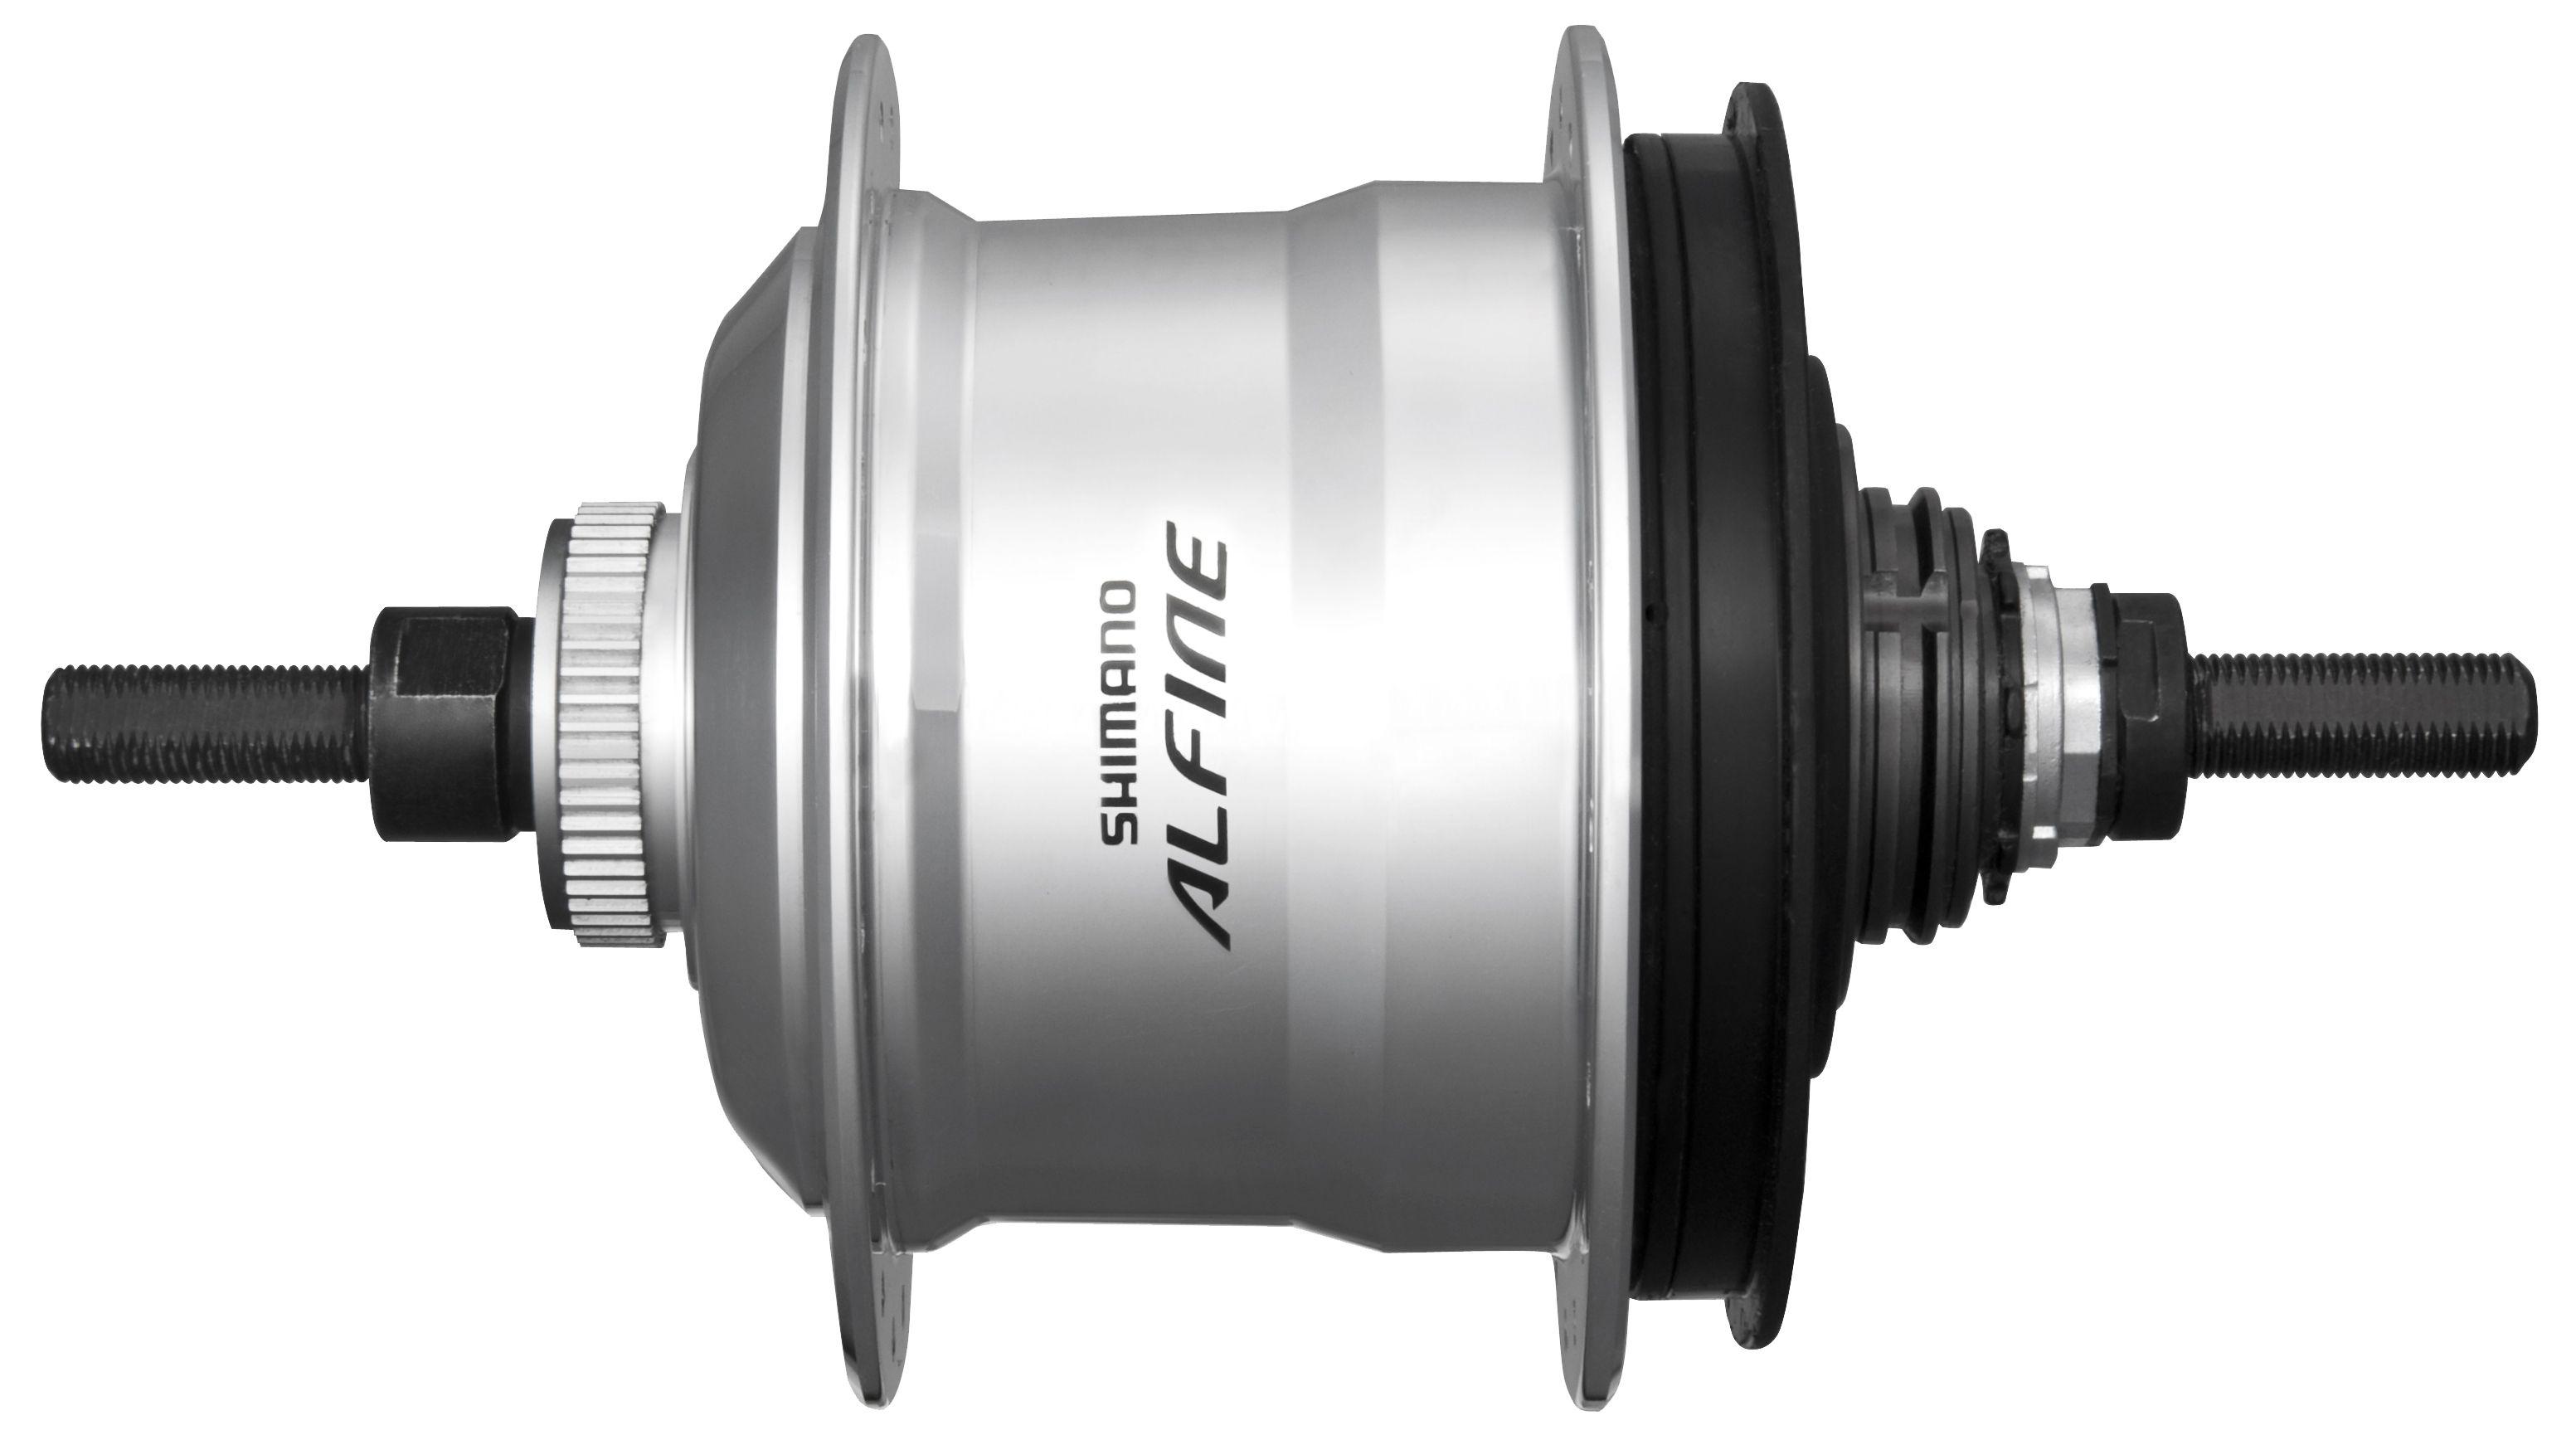 Запчасть Shimano Alfine S700 (ISGS700AS),  втулки  - артикул:286432